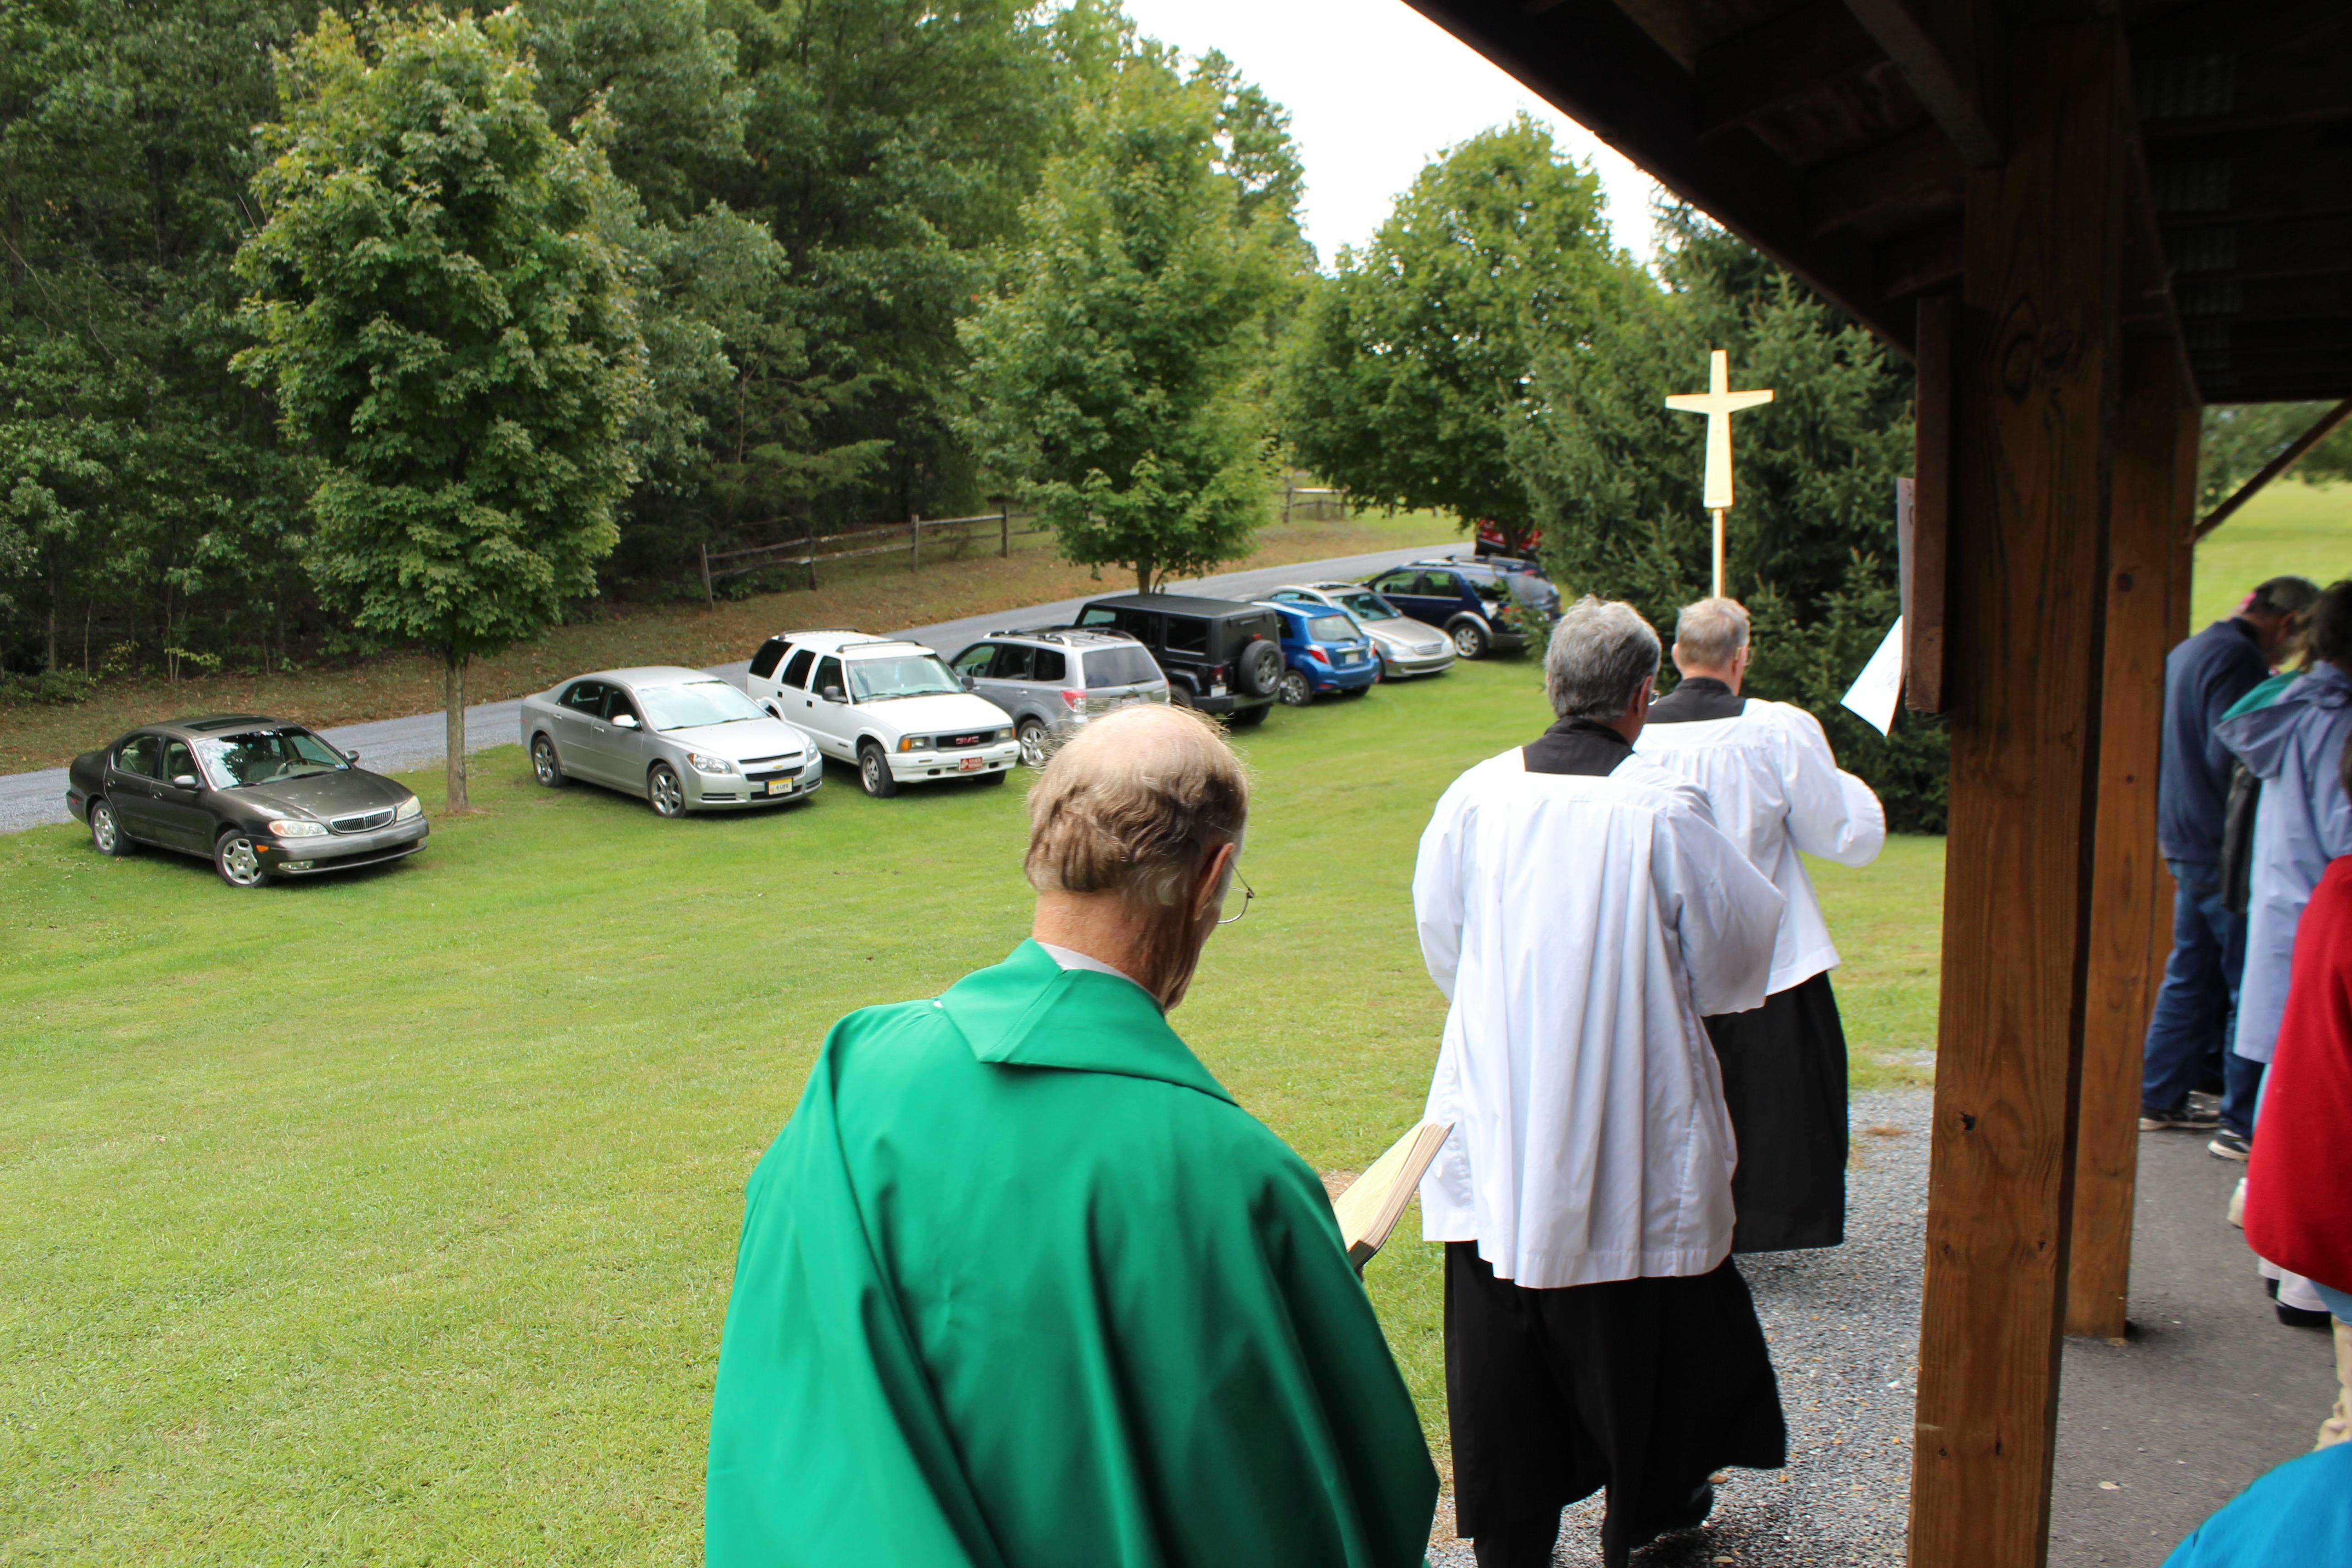 Bob Randy & Fr procession for Mass